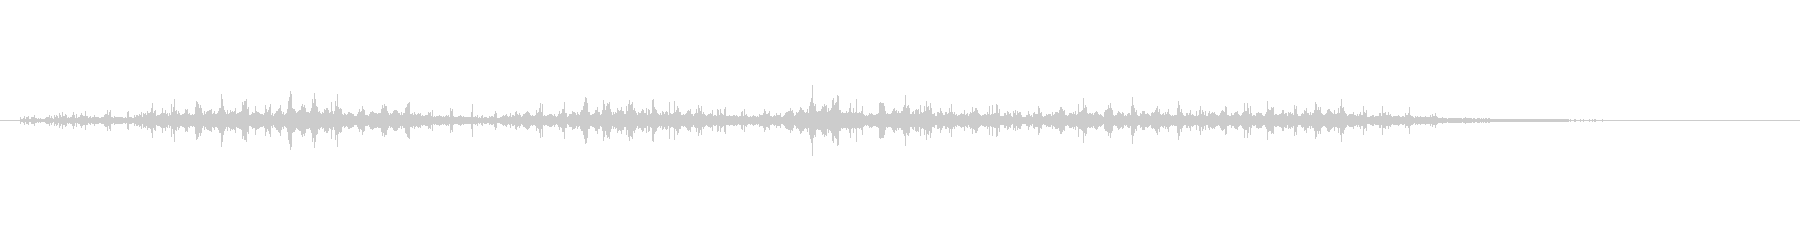 FI 機械 レゾネーターラトルソフト03の未再生の波形